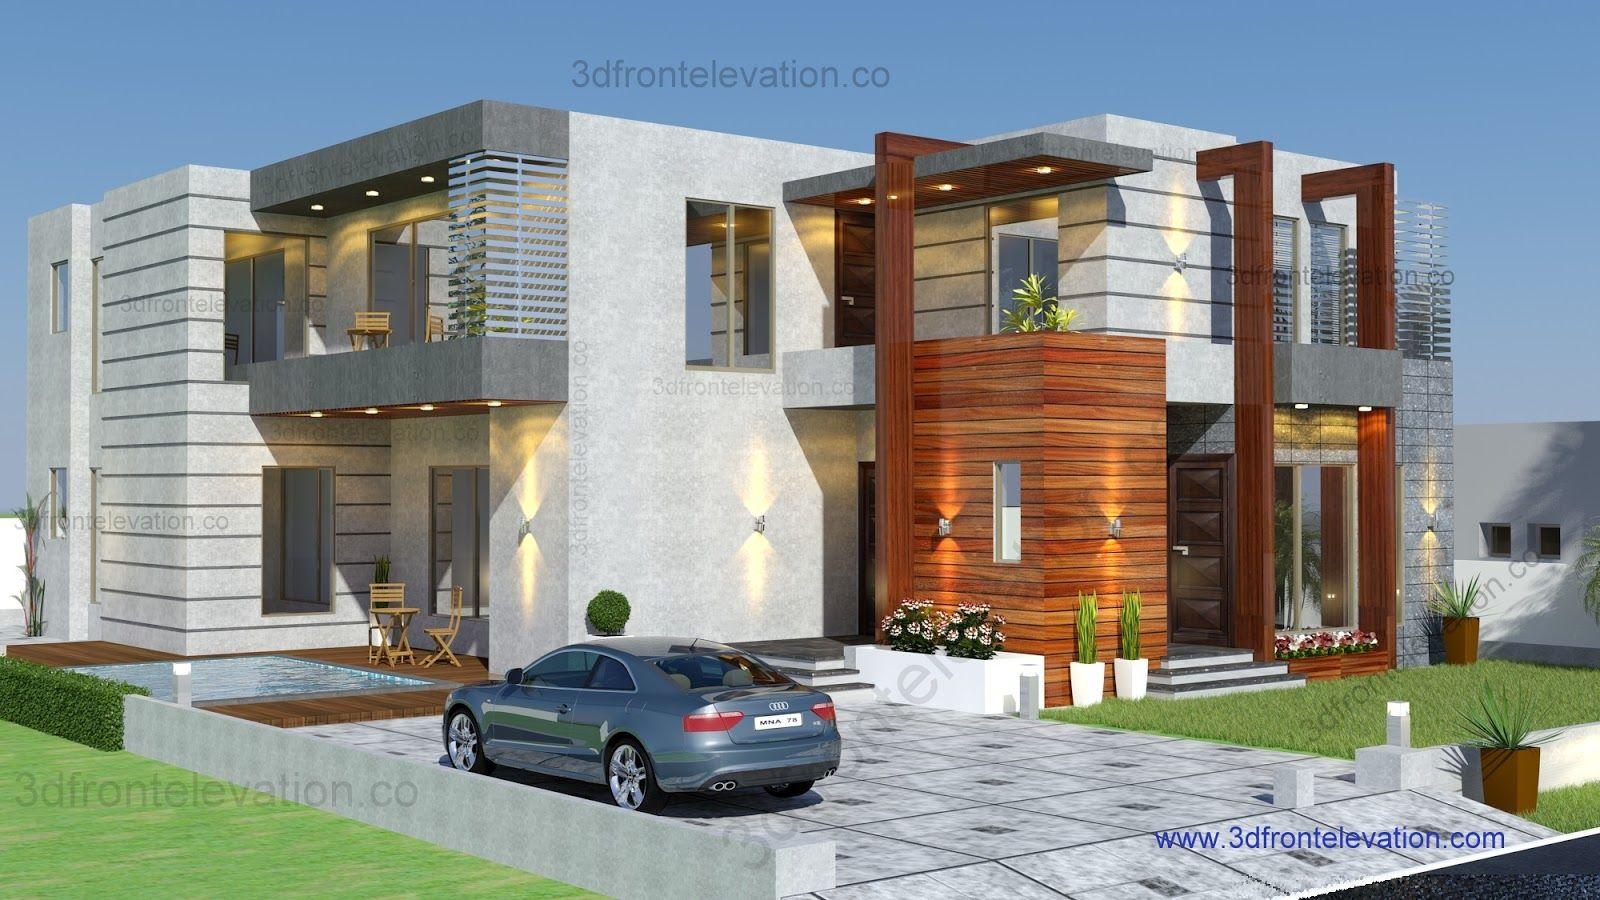 3D Front Elevation.com: PortFolio | Fachadas | Pinterest ...